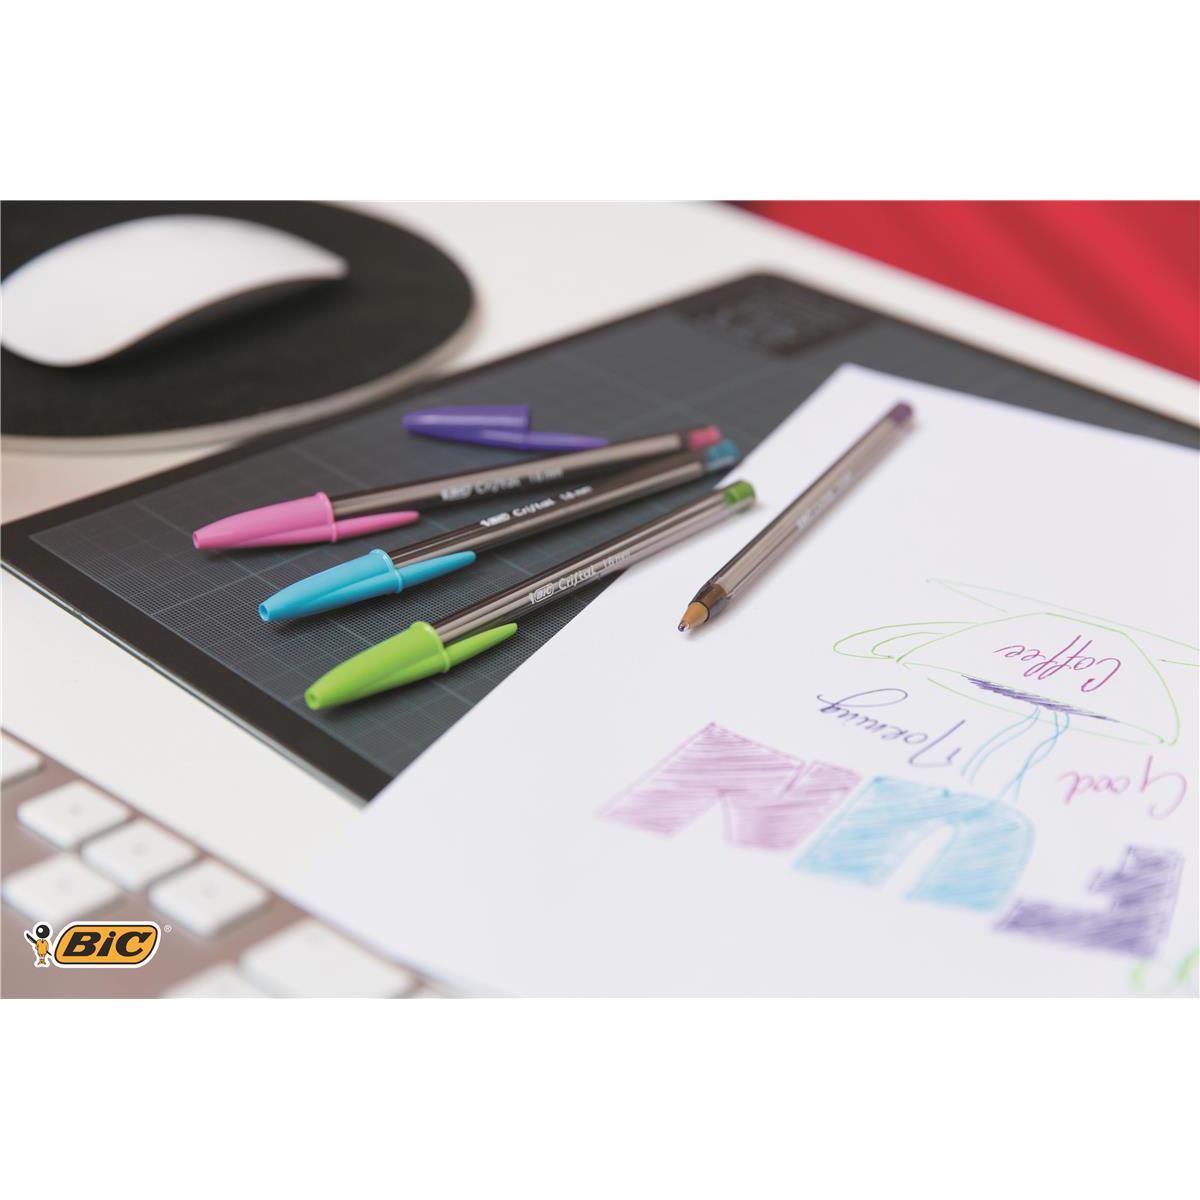 Bic Cristal Fun Ball Pen Large 1.6mm Tip 0.42mm Line Purple Ref 929055 Pack 20